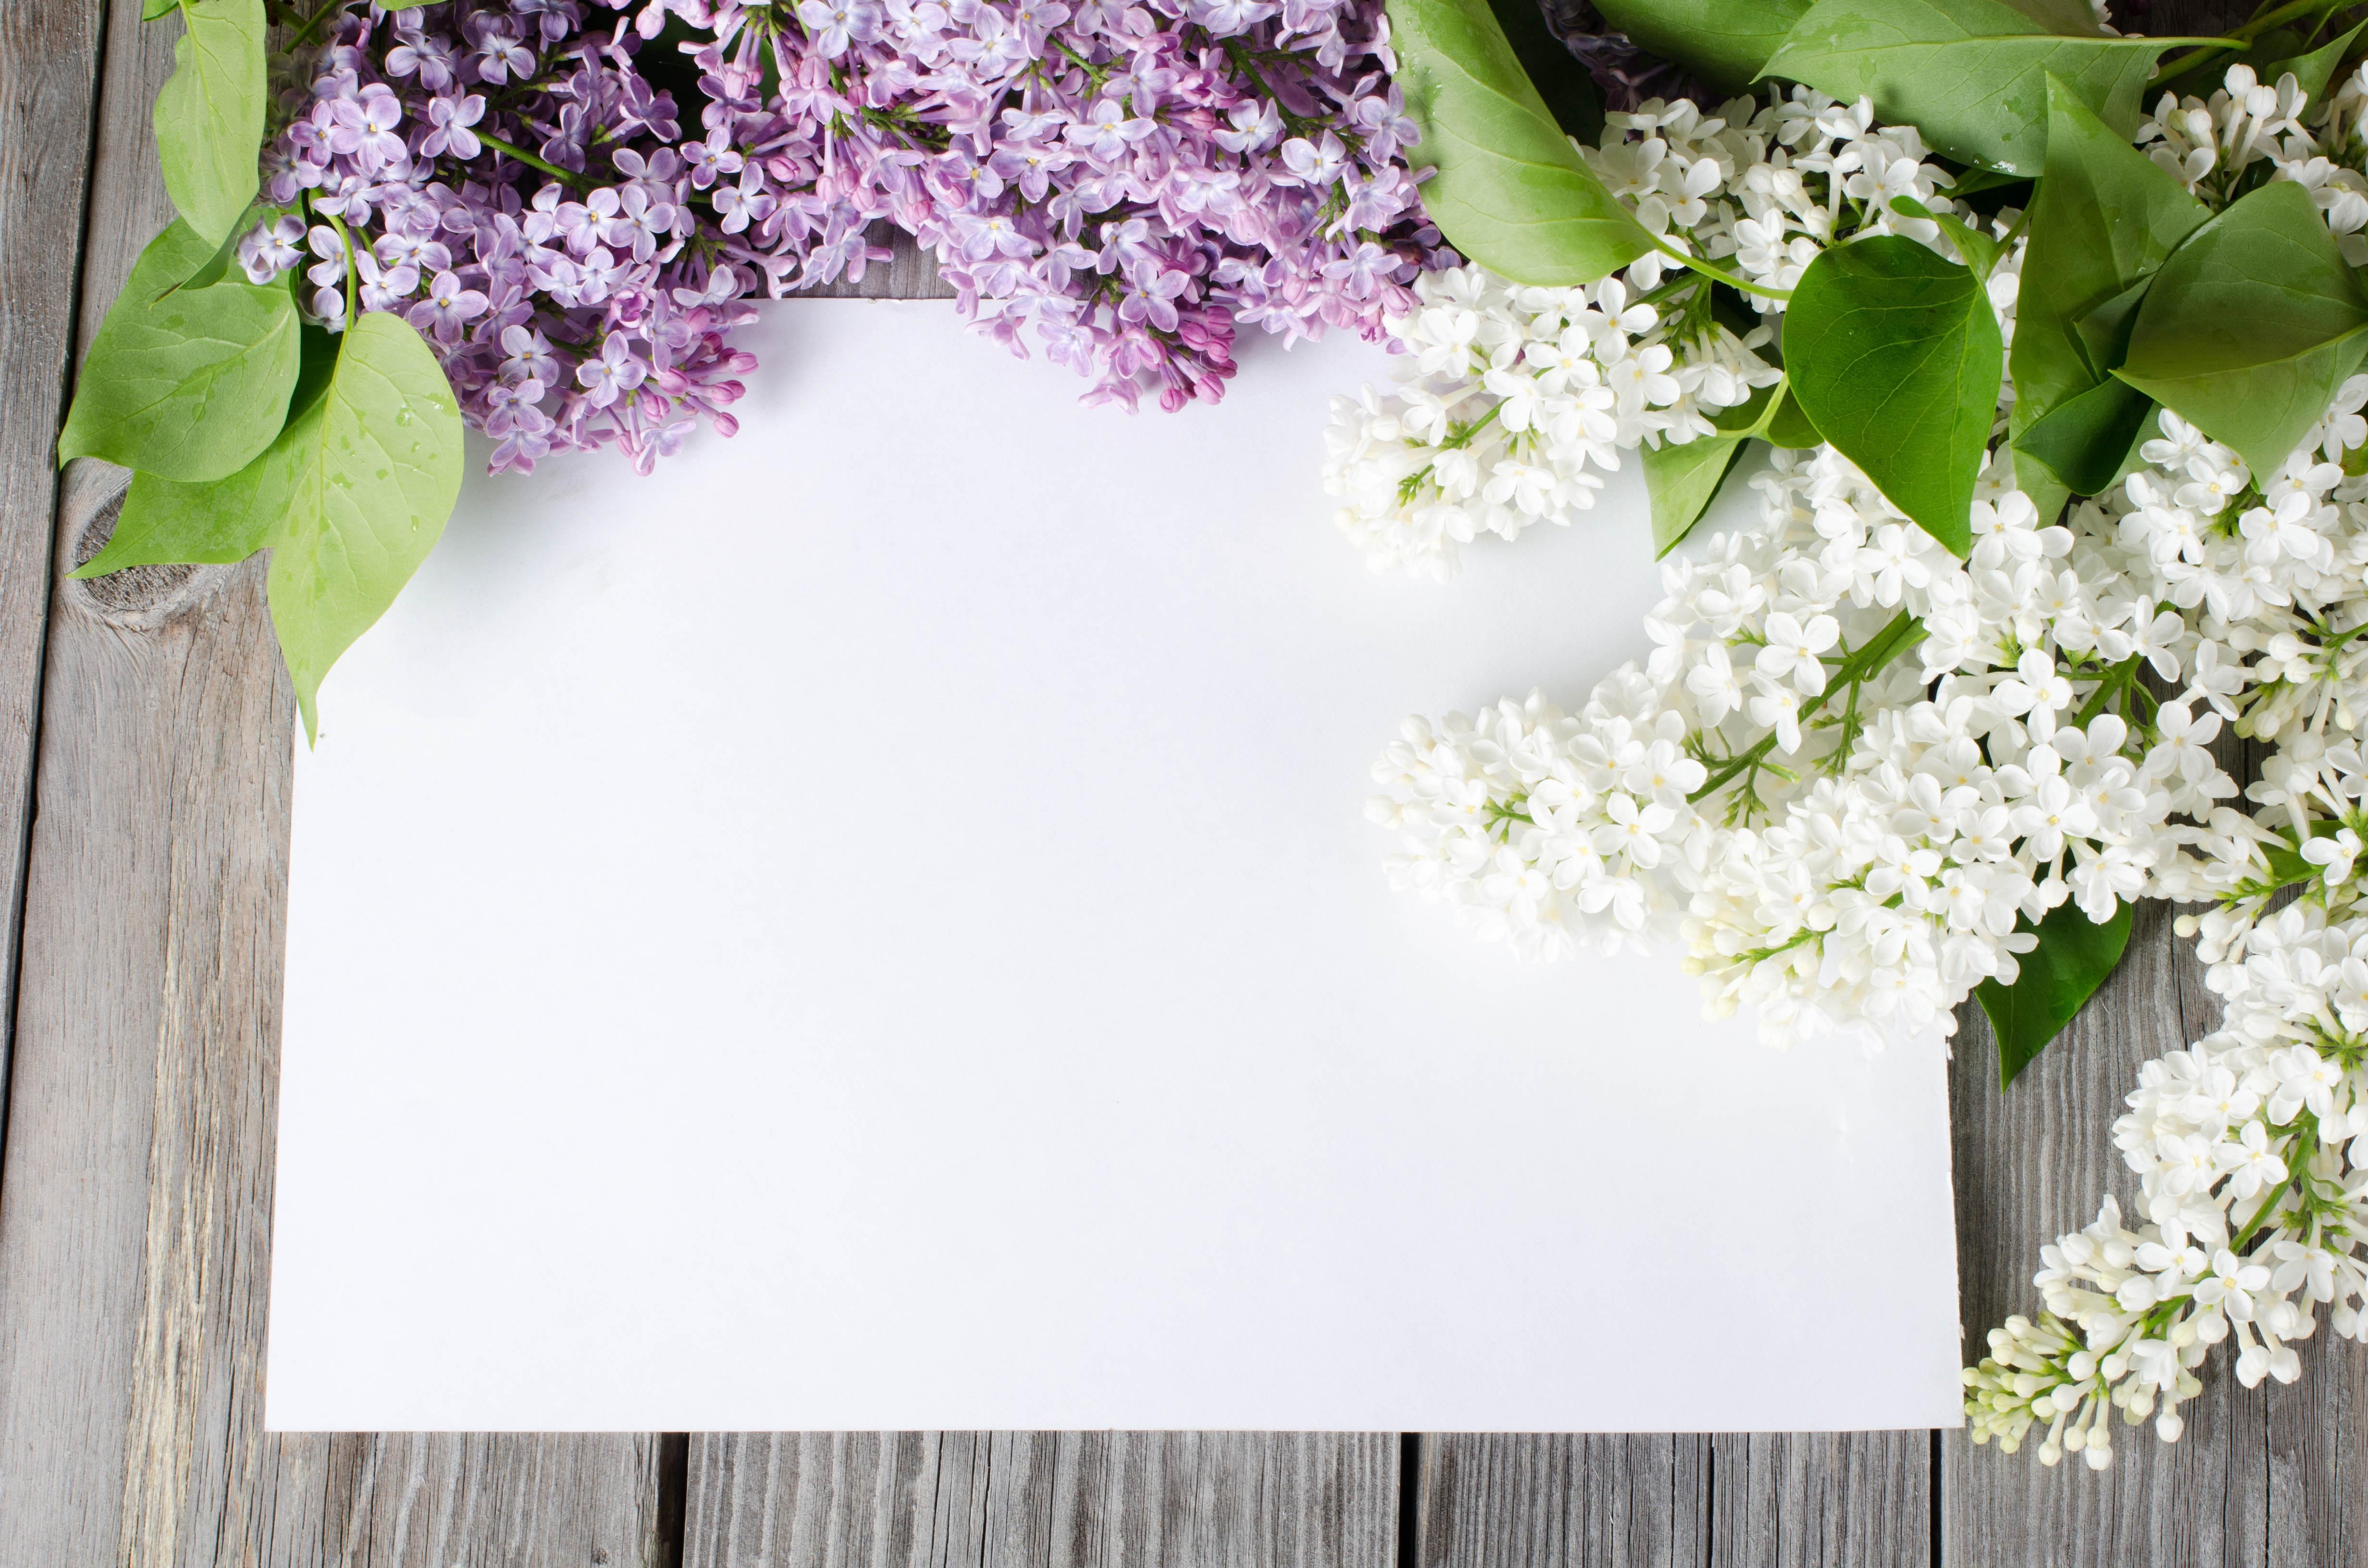 белый лист с цветами картинки